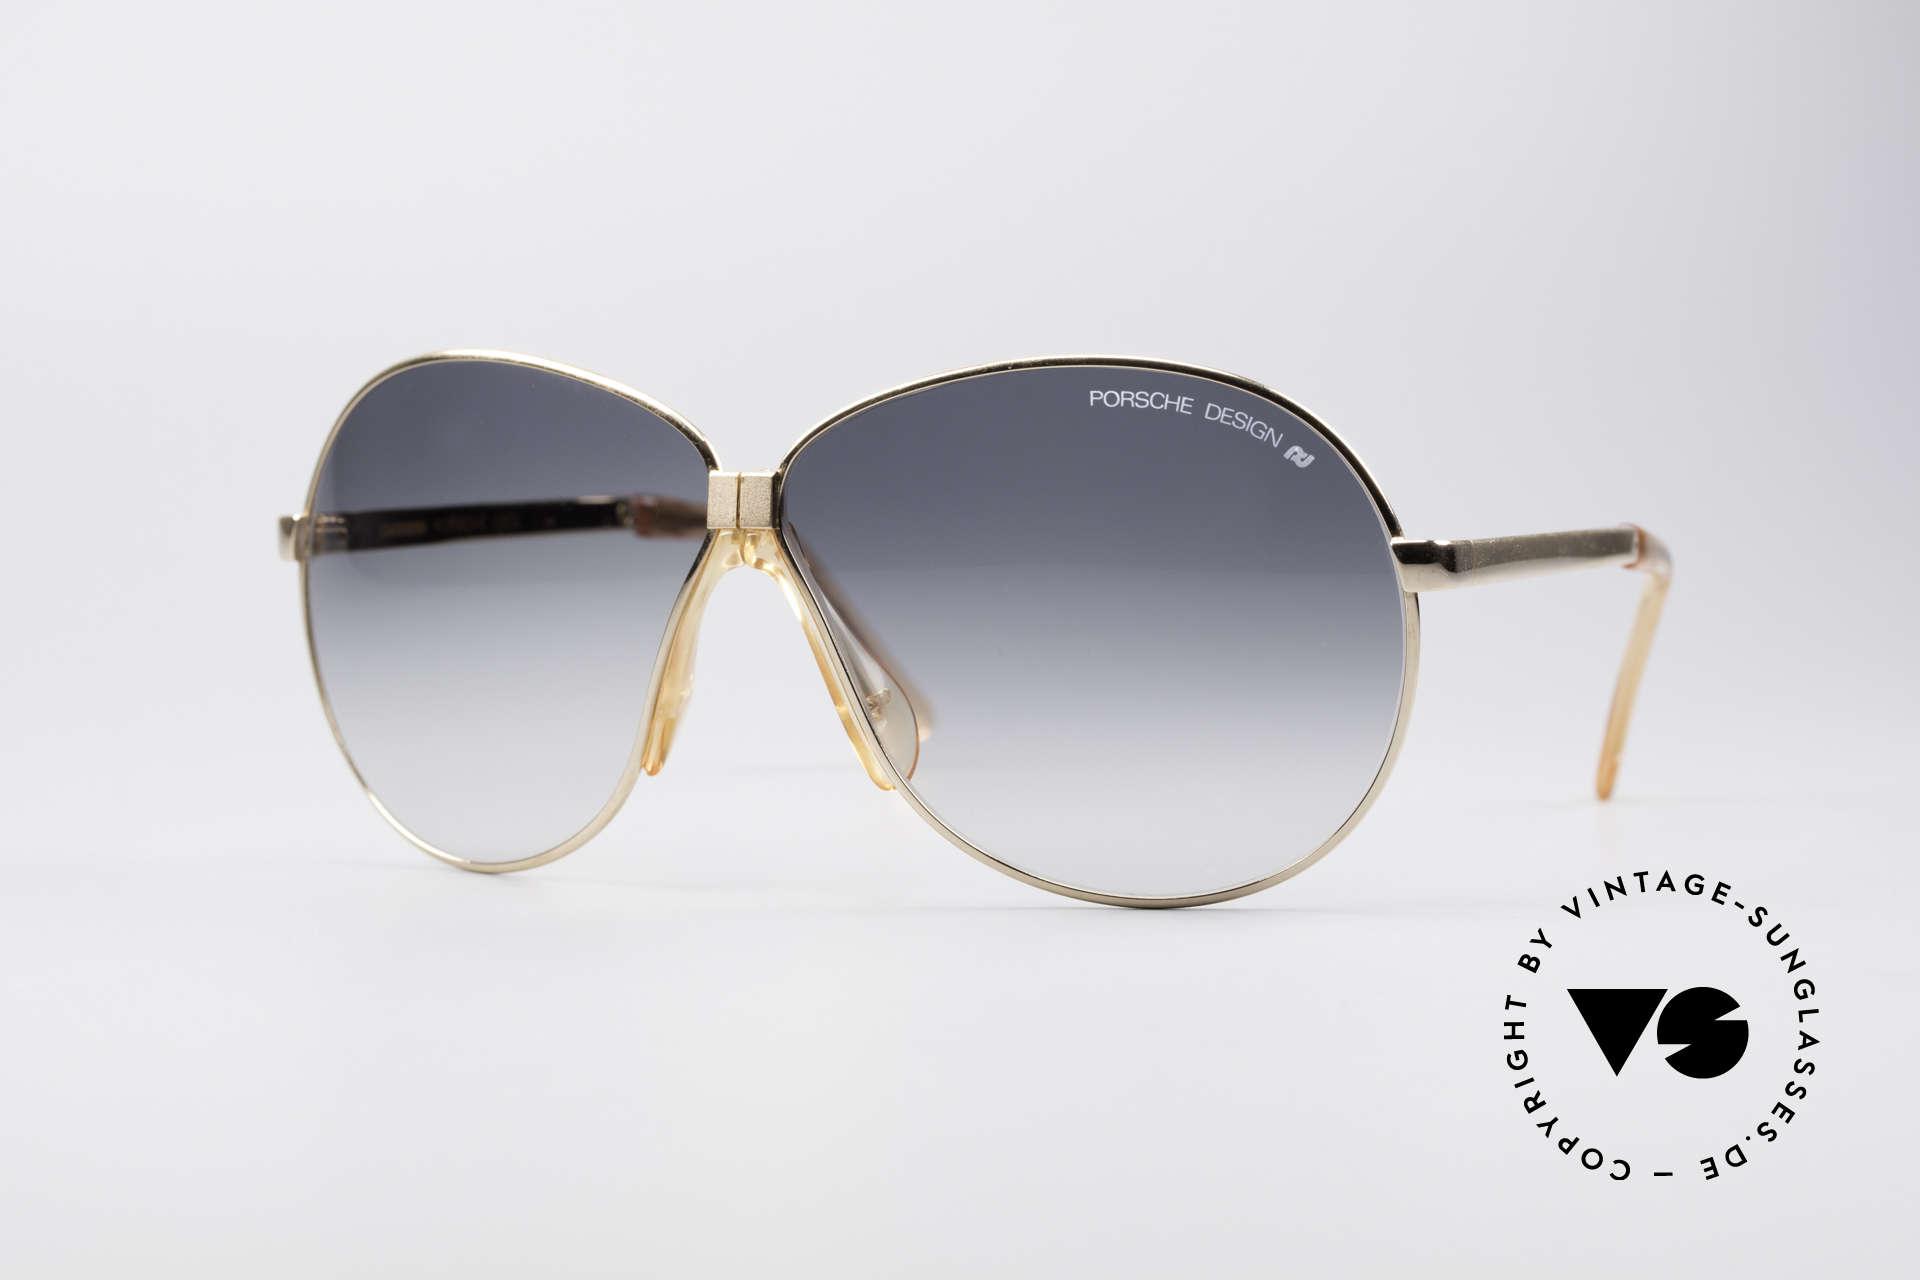 54e0956ed7cb Sunglasses Porsche 5626 Ladies Folding Sunglasses